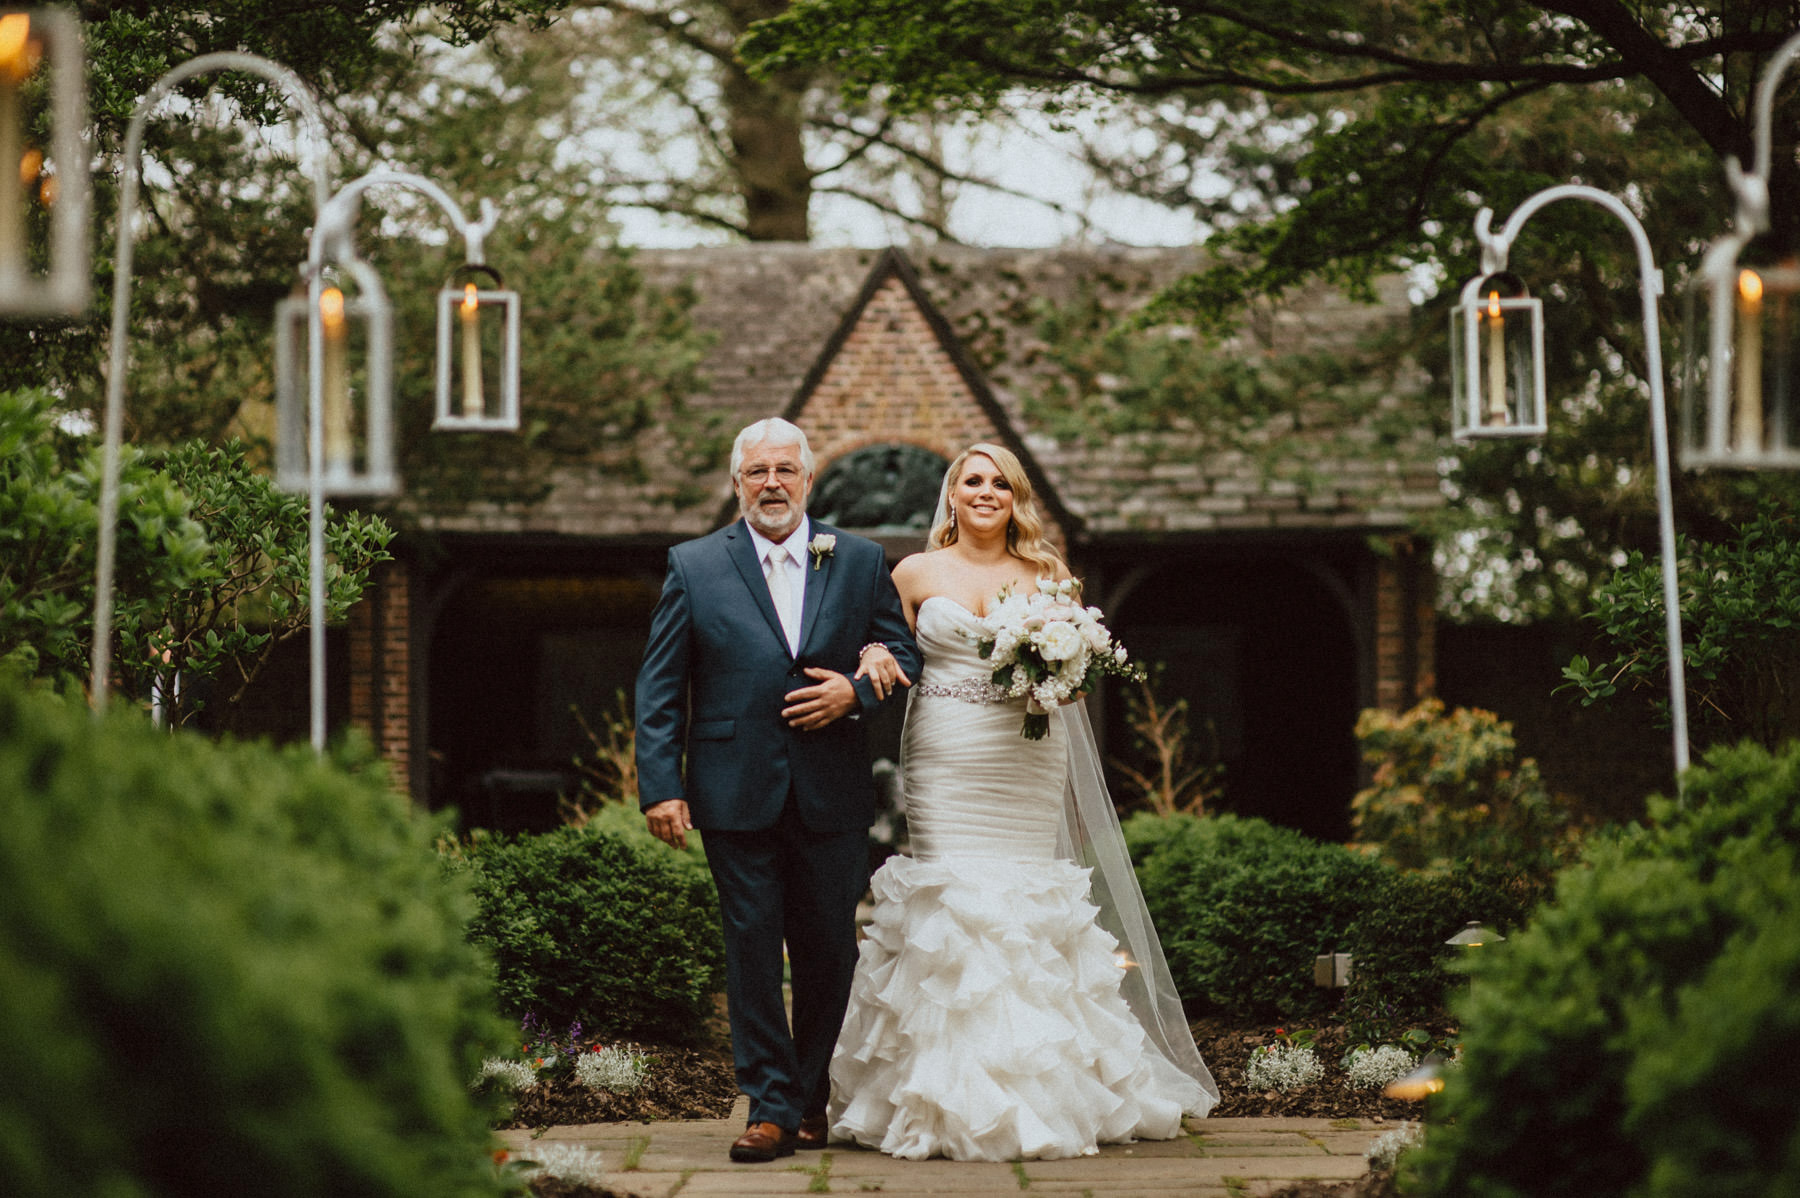 232-greenville-country-club-wedding-7.jpg